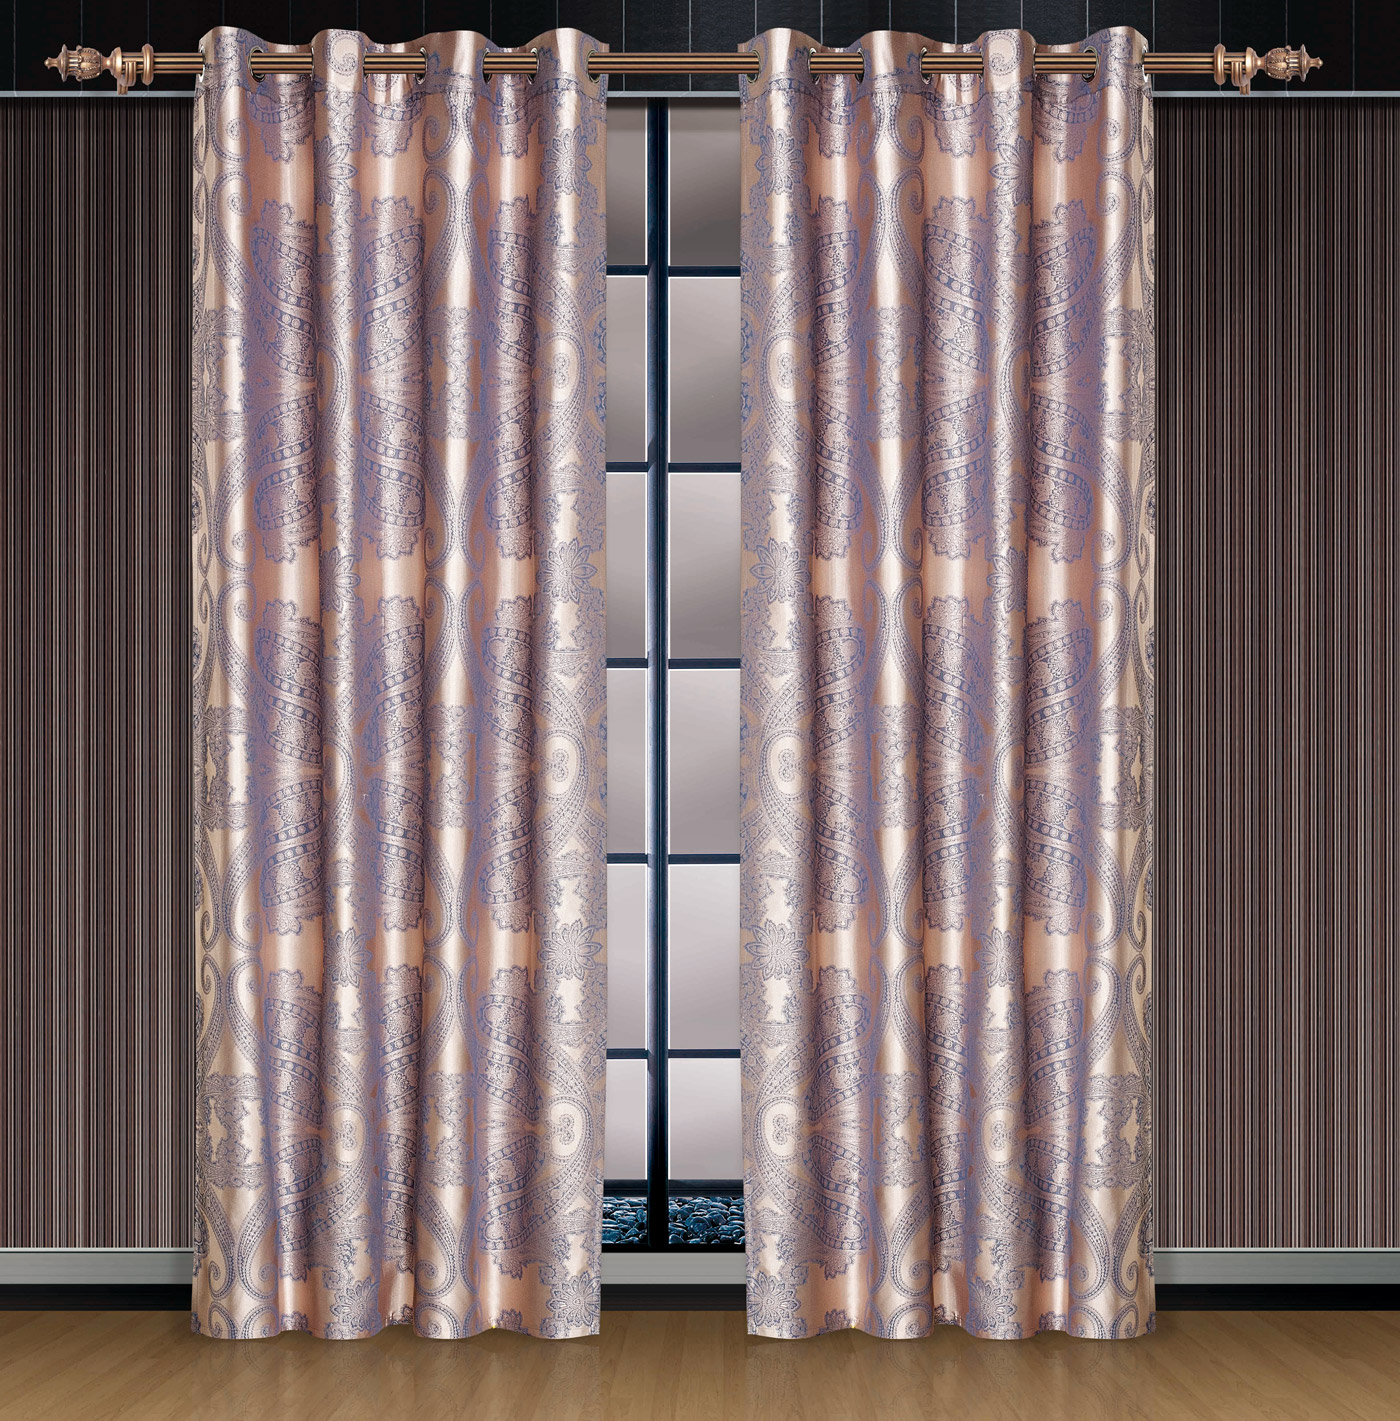 468-Iris-Dolce-Mela-Window-Treatments-Drapes-Curtain-Panel.jpg